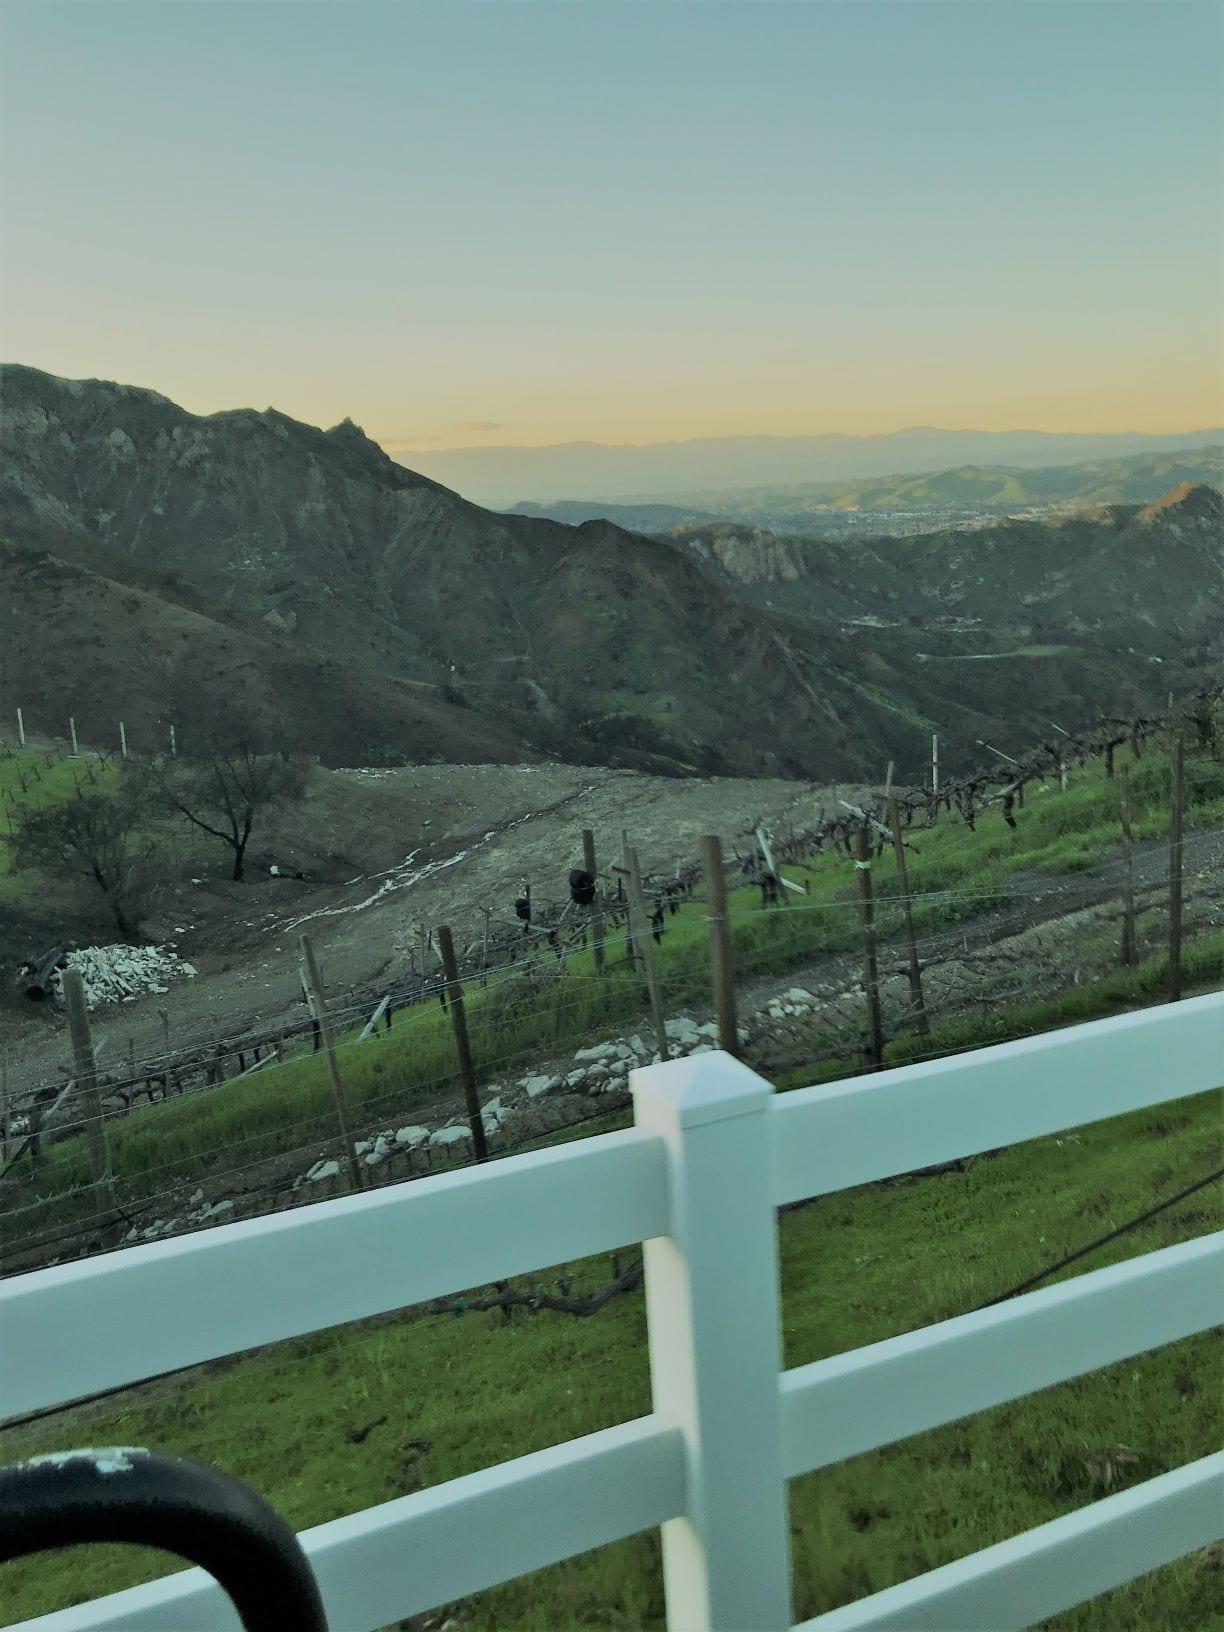 A view of the Malibu vineyard cliffs